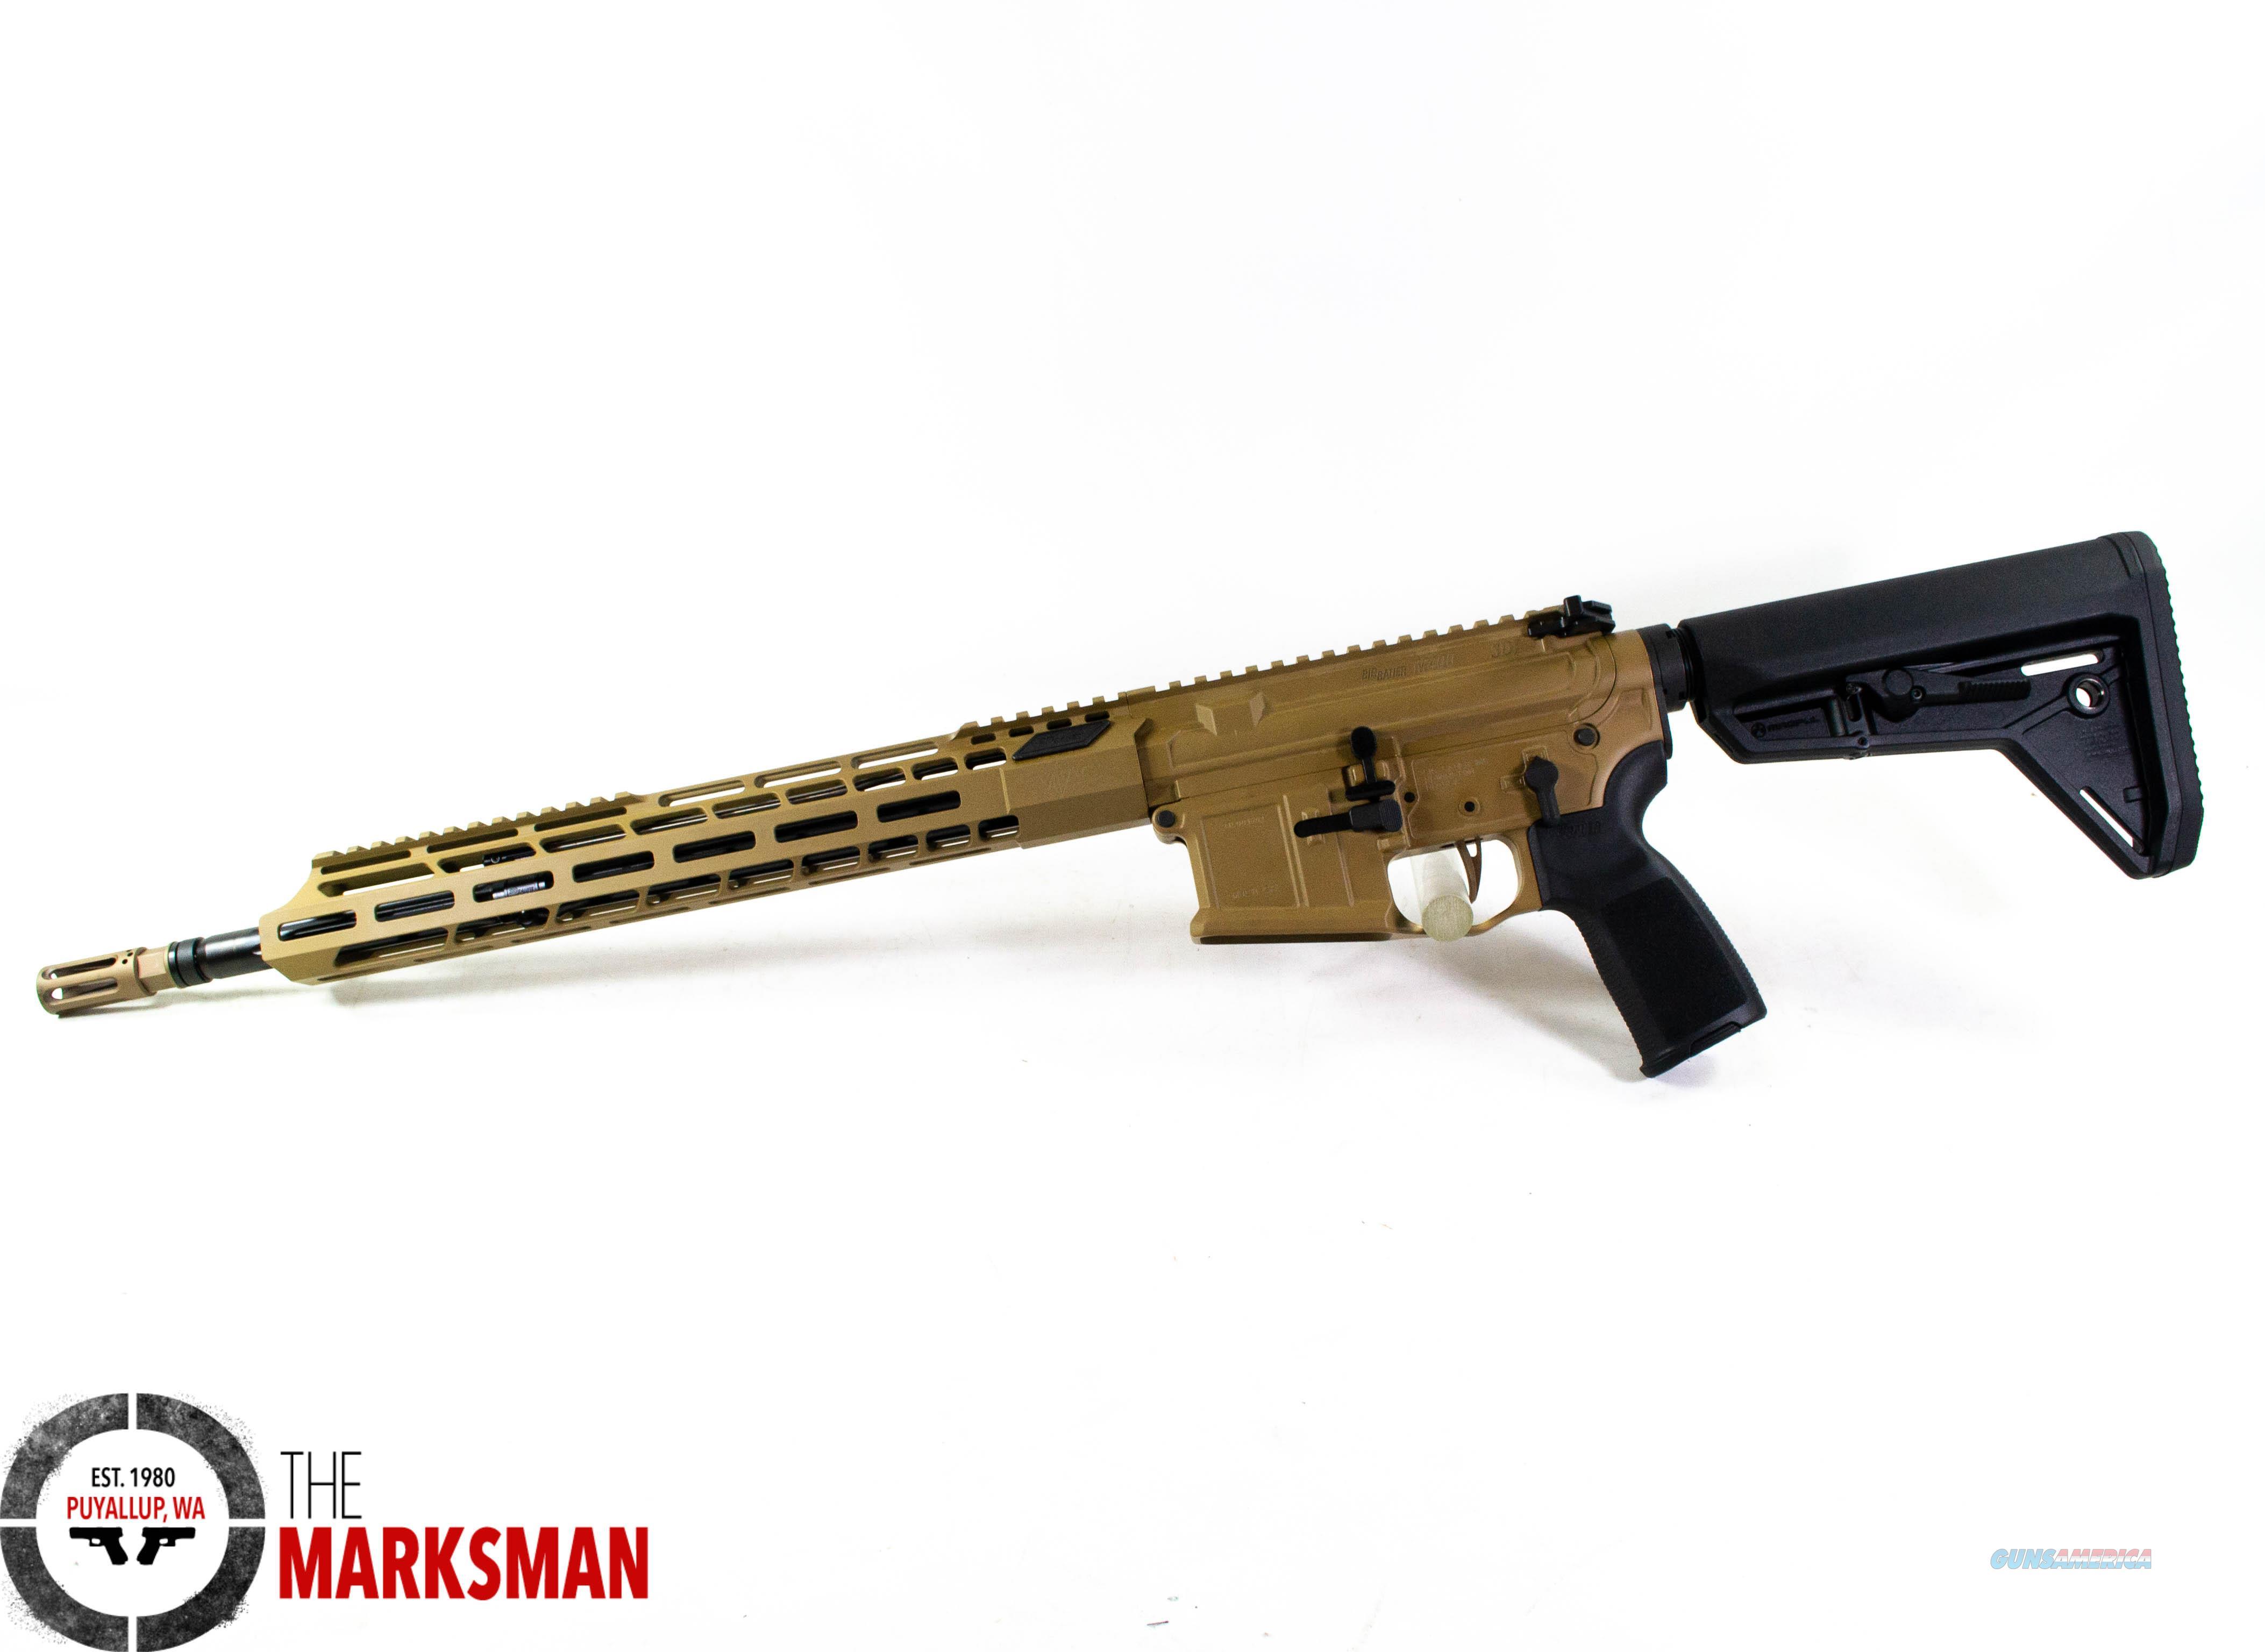 Sig Sauer M400 SDI VTAC, 5.56mm NATO NEW Free Shipping  Guns > Rifles > Sig - Sauer/Sigarms Rifles